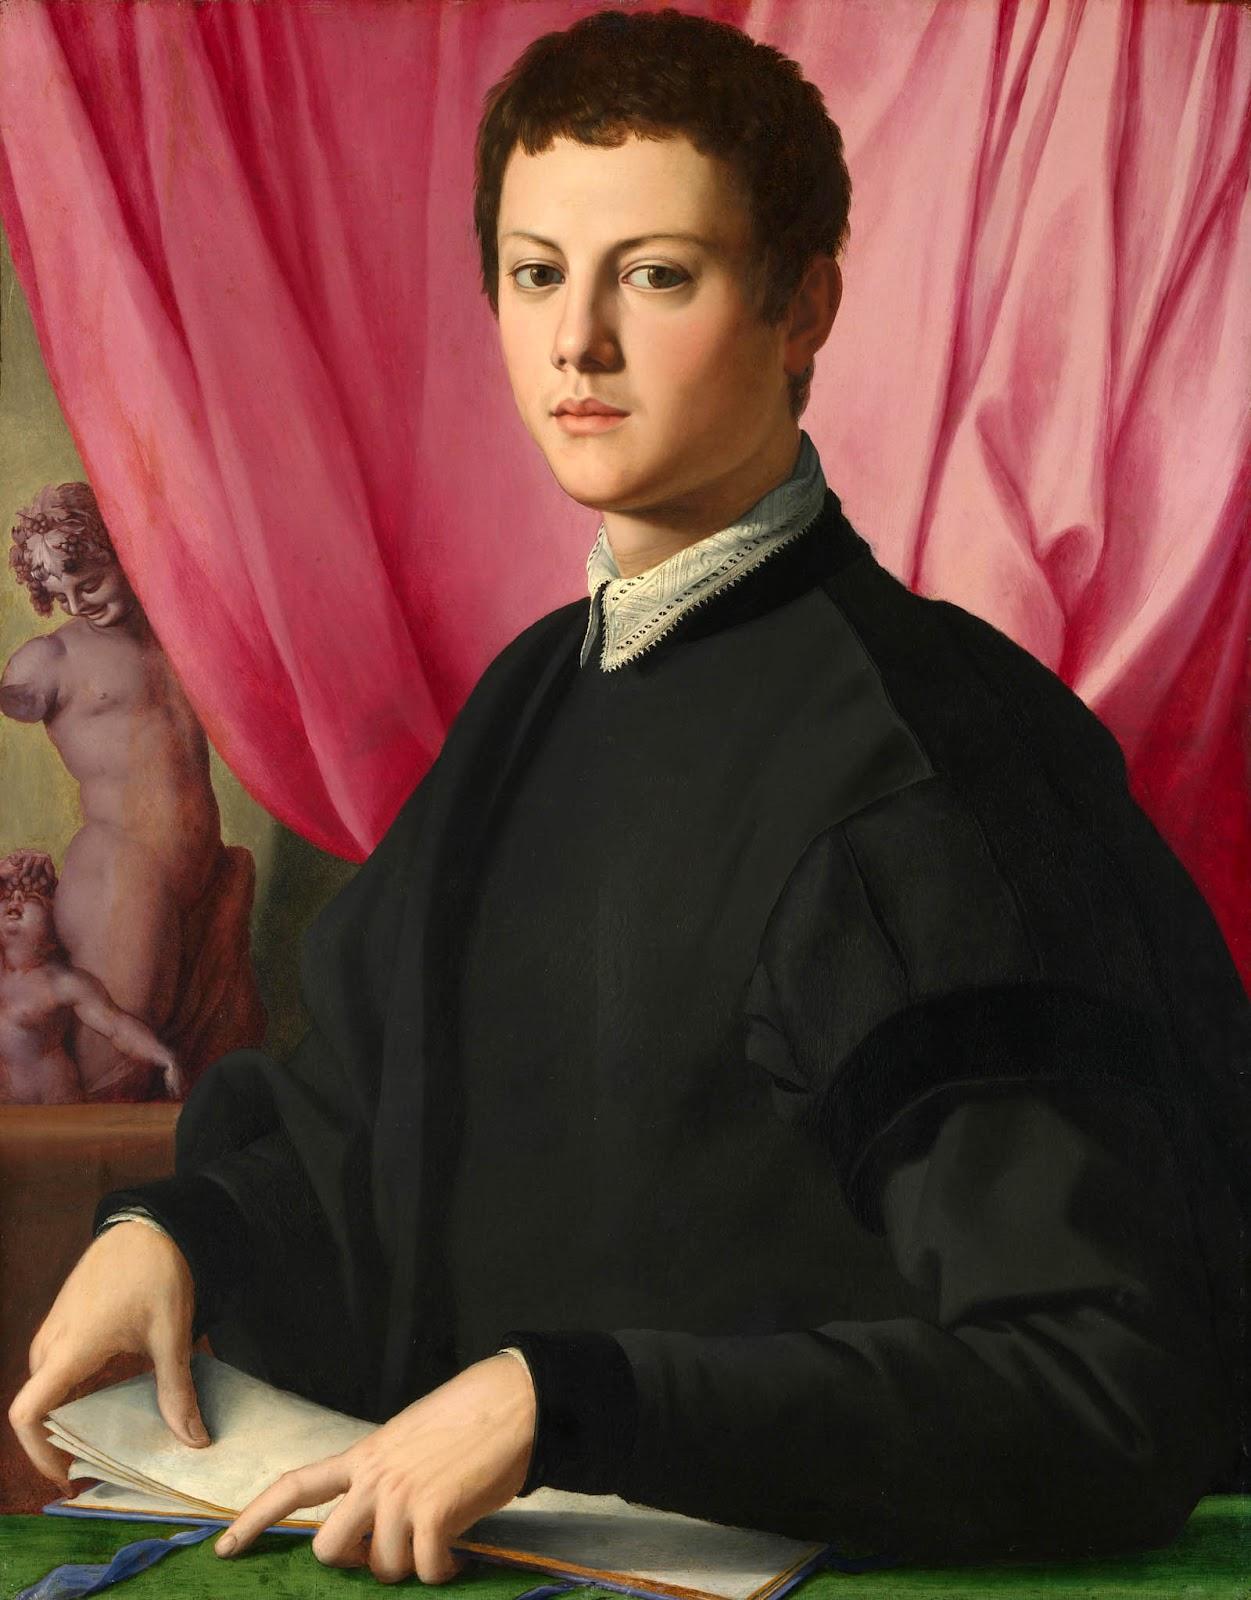 Westward the Course of Empire Takes Its Way: Bronzino | 1251 x 1600 jpeg 221kB